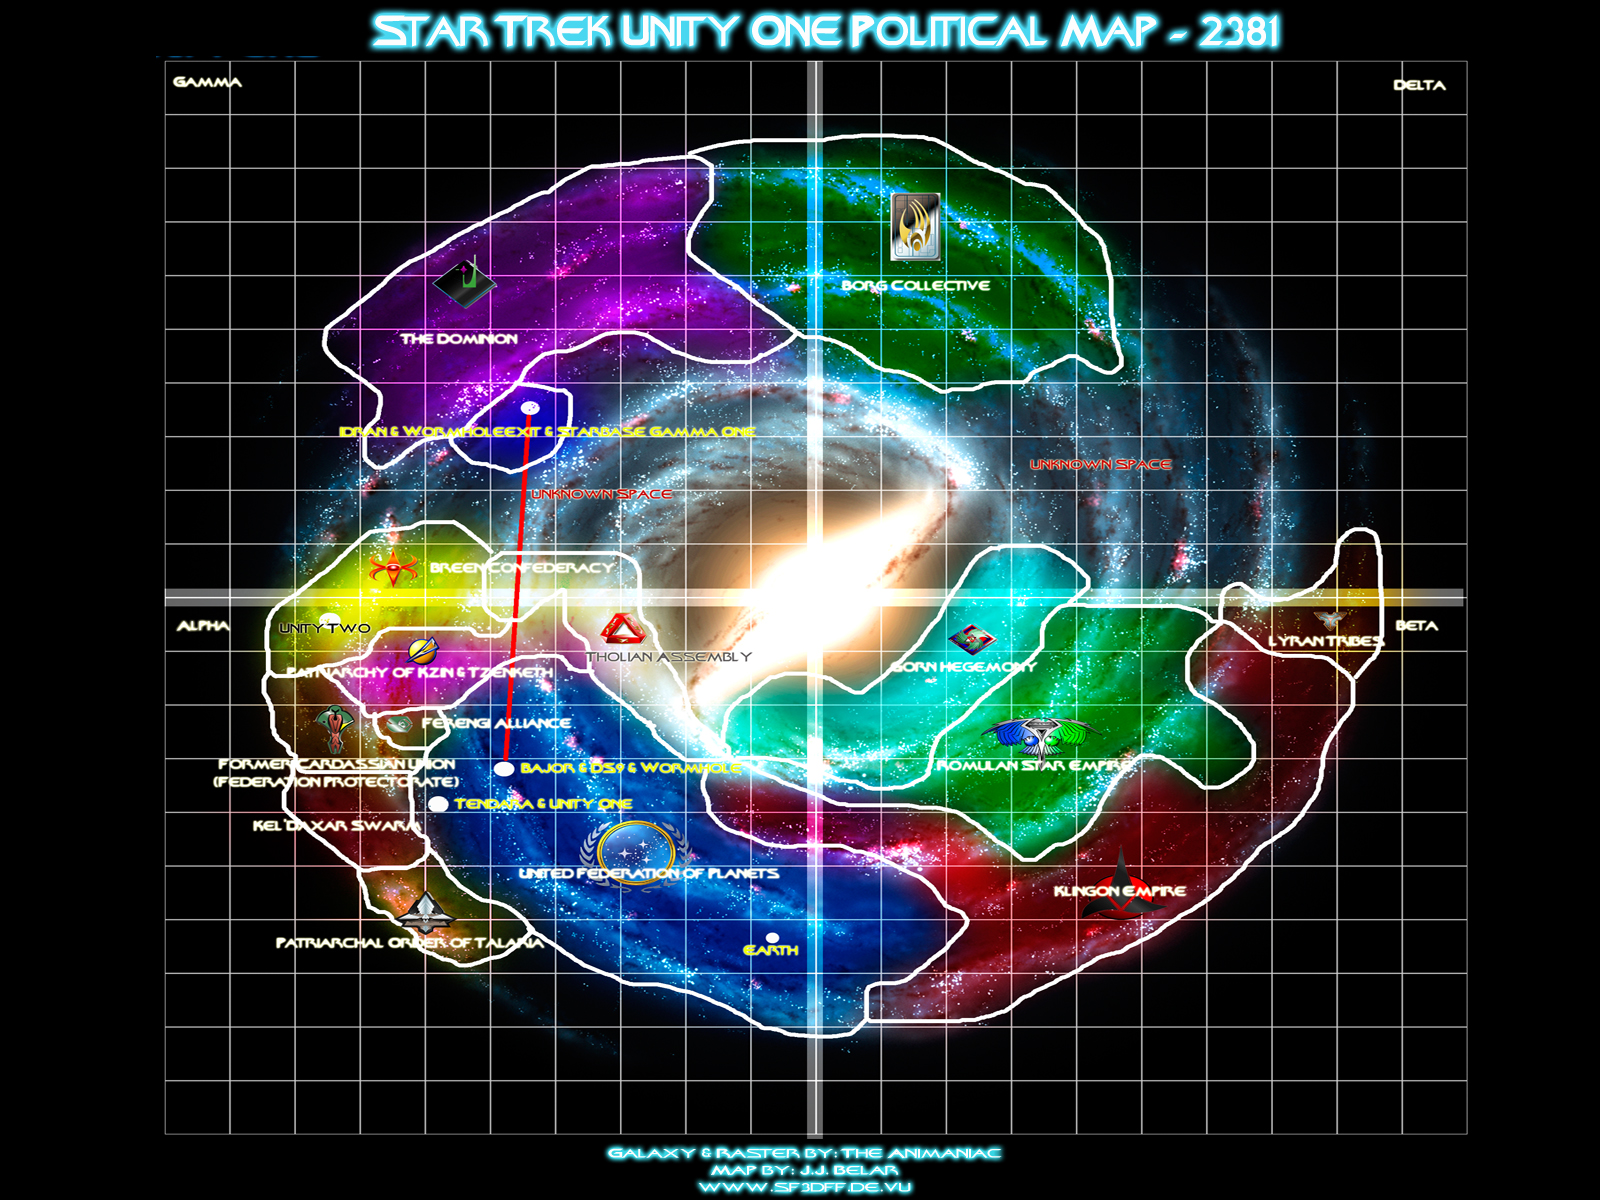 Milky Way Galaxy Of Star Trek Races Or Species Triton World